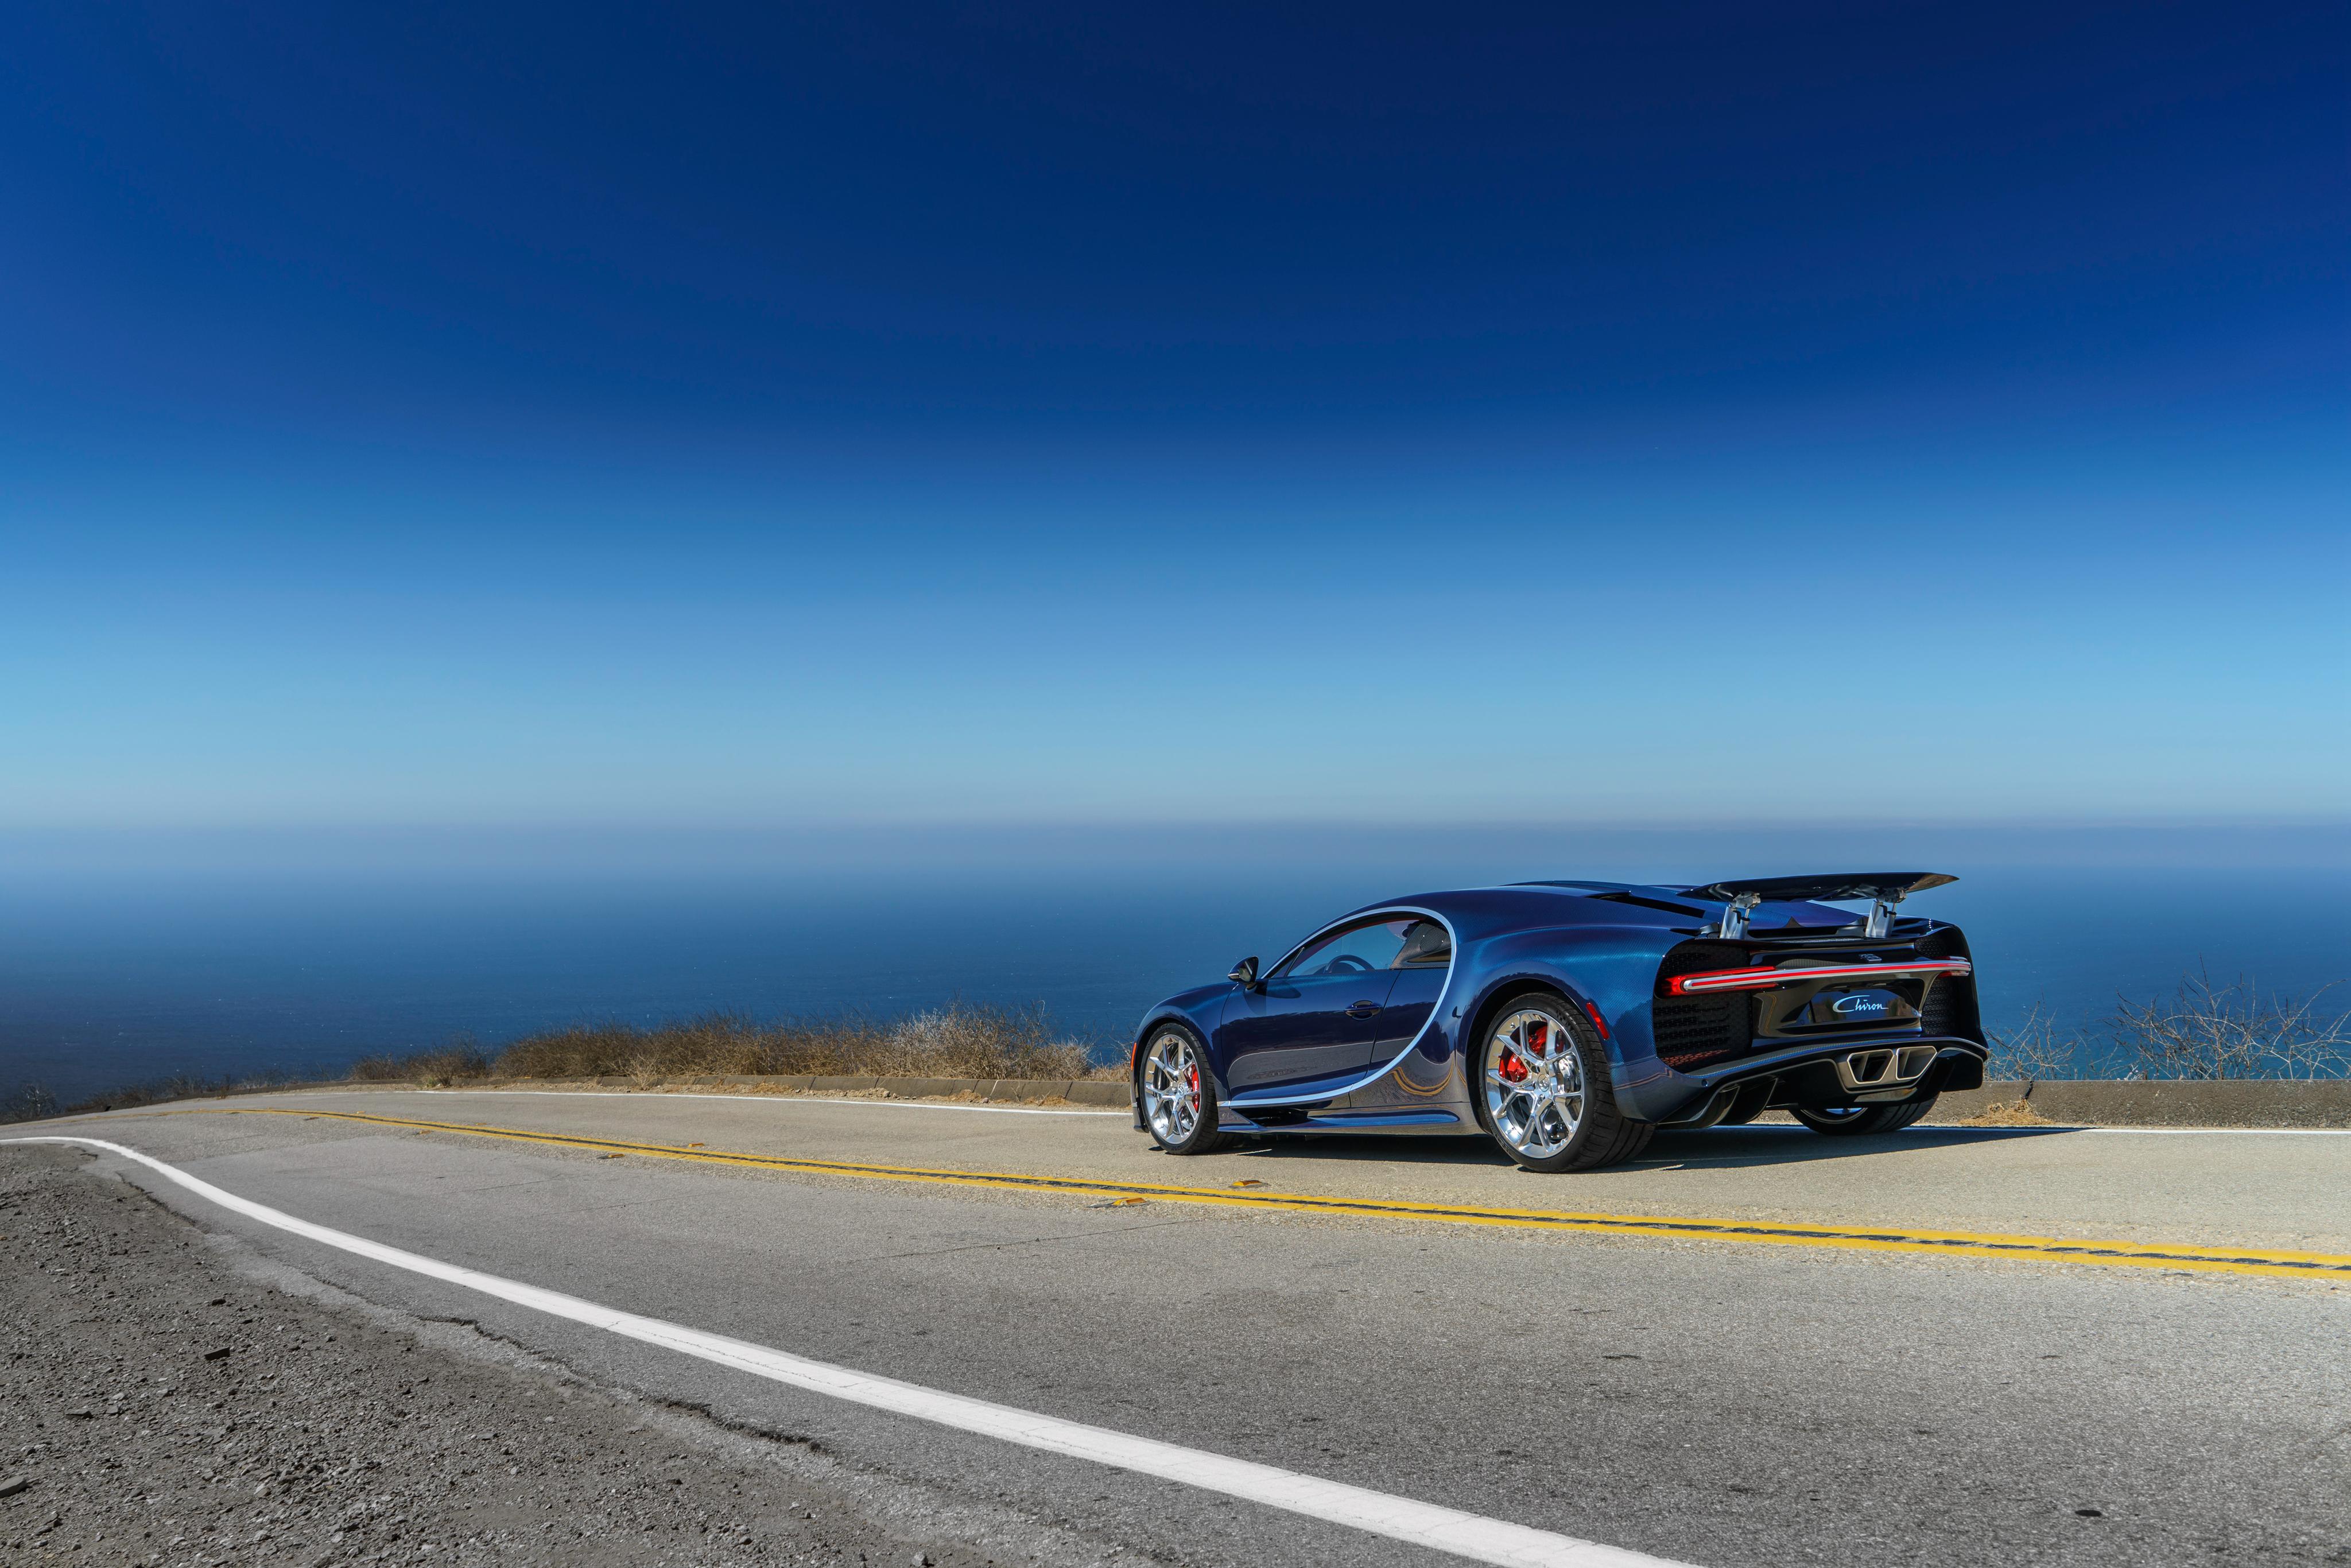 98417 скачать обои Бугатти (Bugatti), Тачки (Cars), Дорога, Вид Сбоку, Chiron - заставки и картинки бесплатно